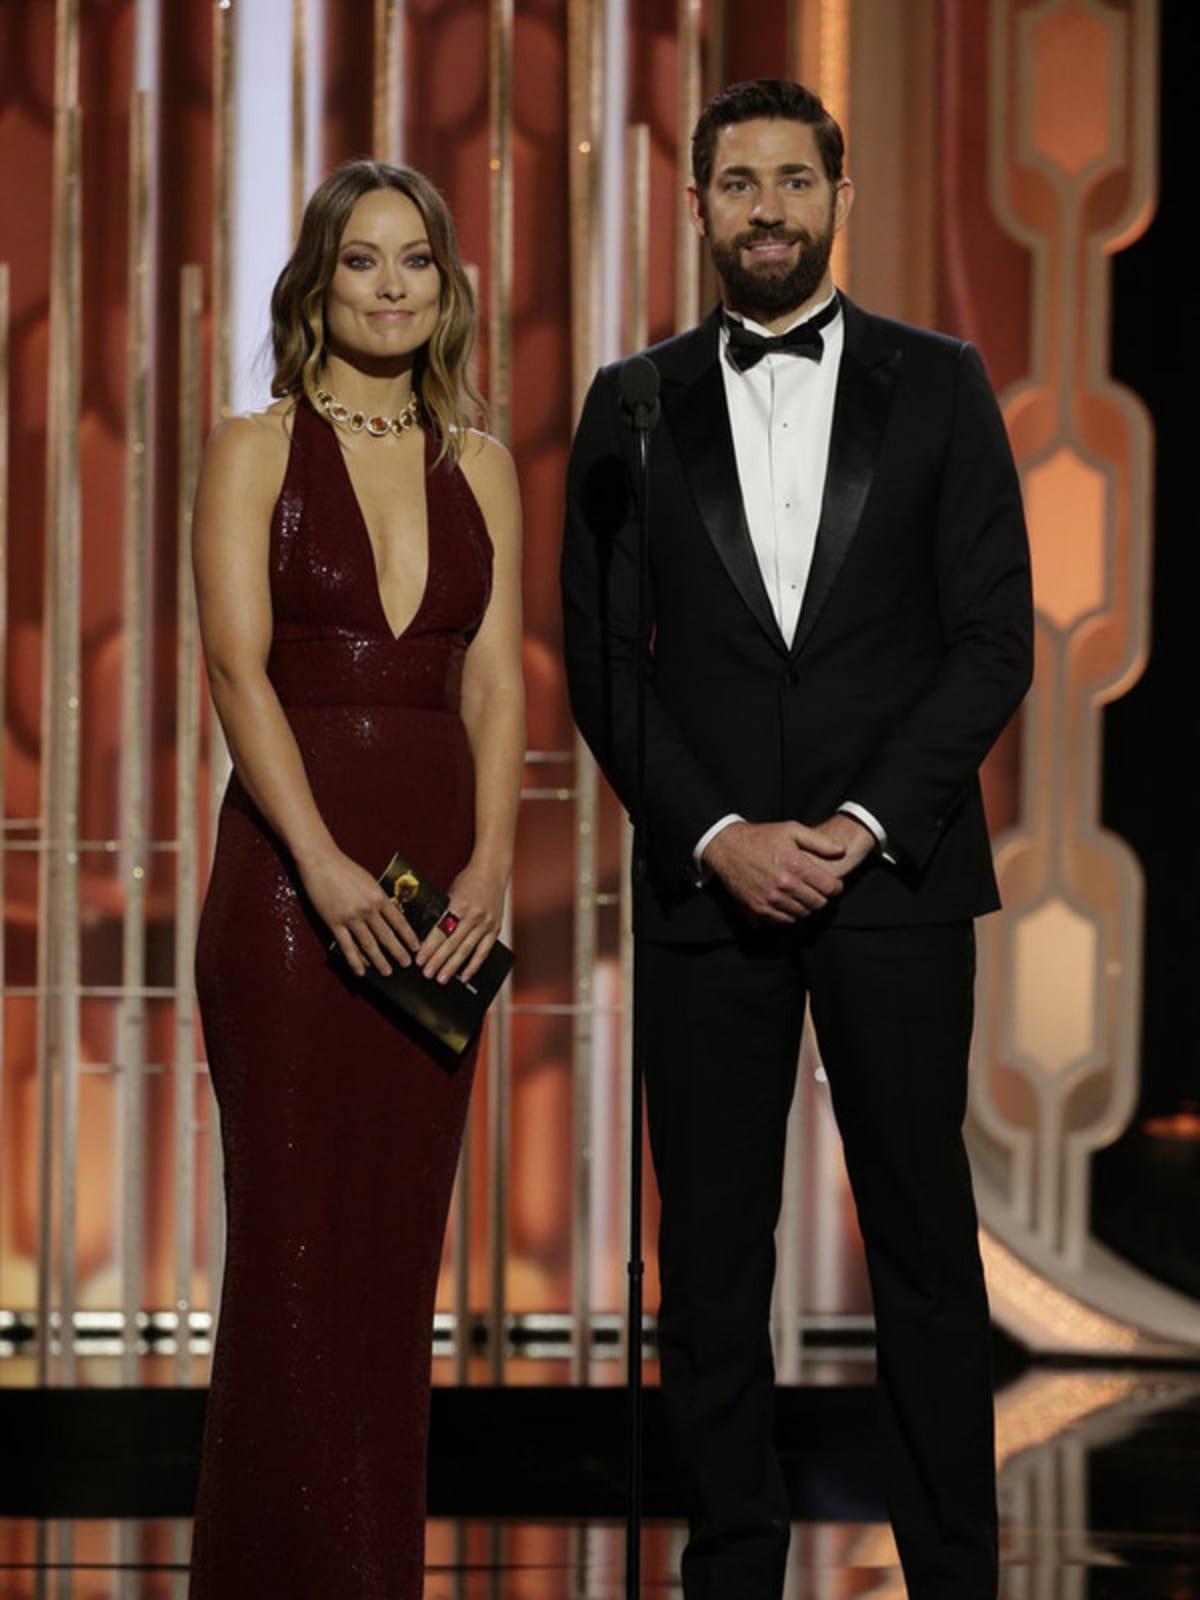 Olivia Wilde and John Krasinski at Golden Globe Awards